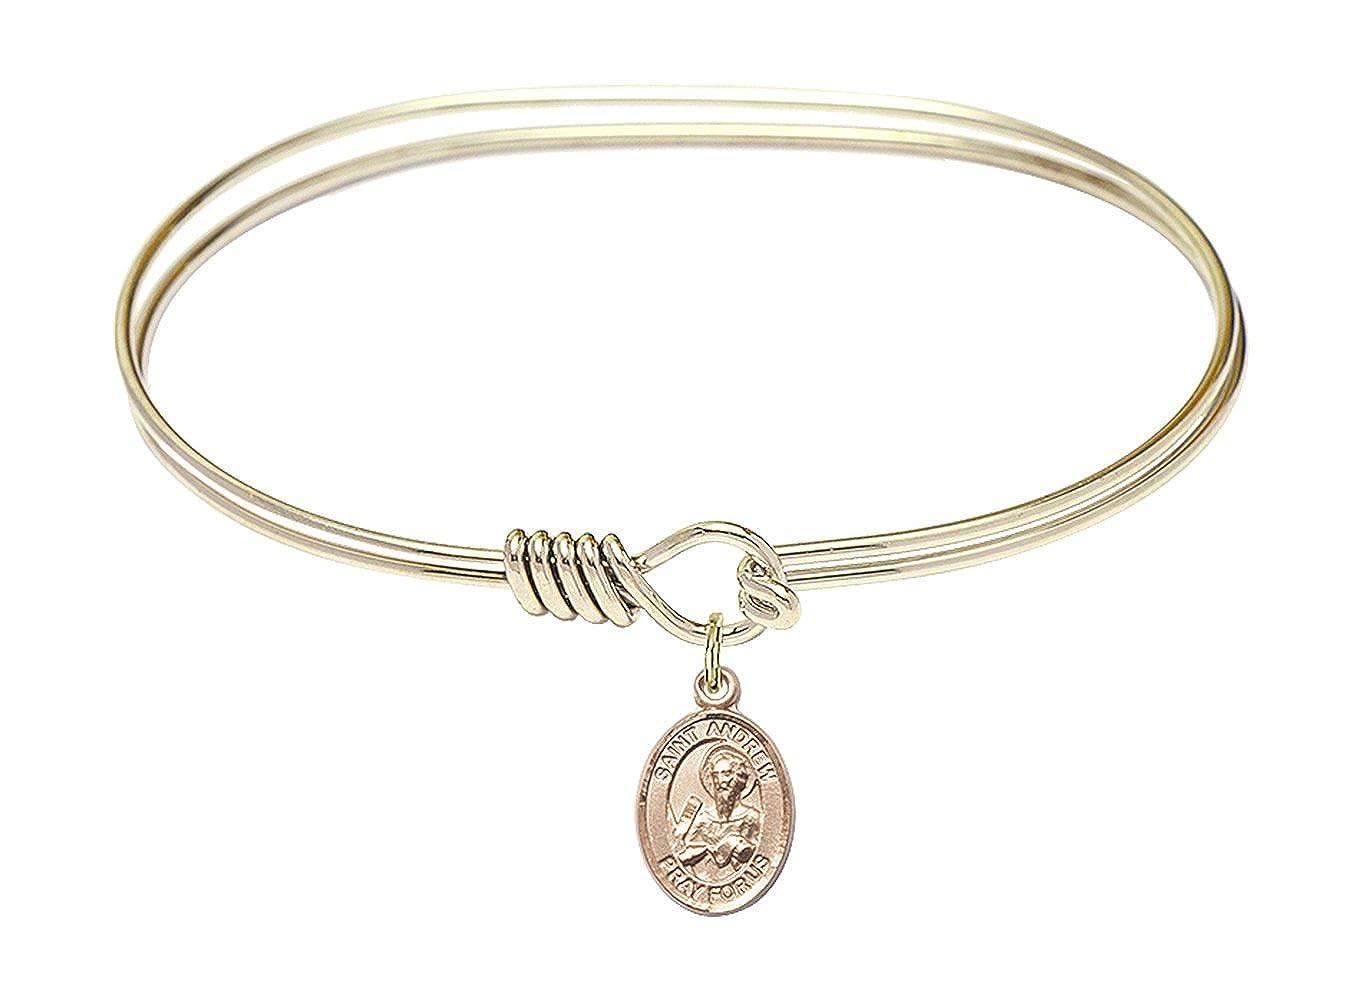 DiamondJewelryNY Eye Hook Bangle Bracelet with a St Andrew The Apostle Charm.